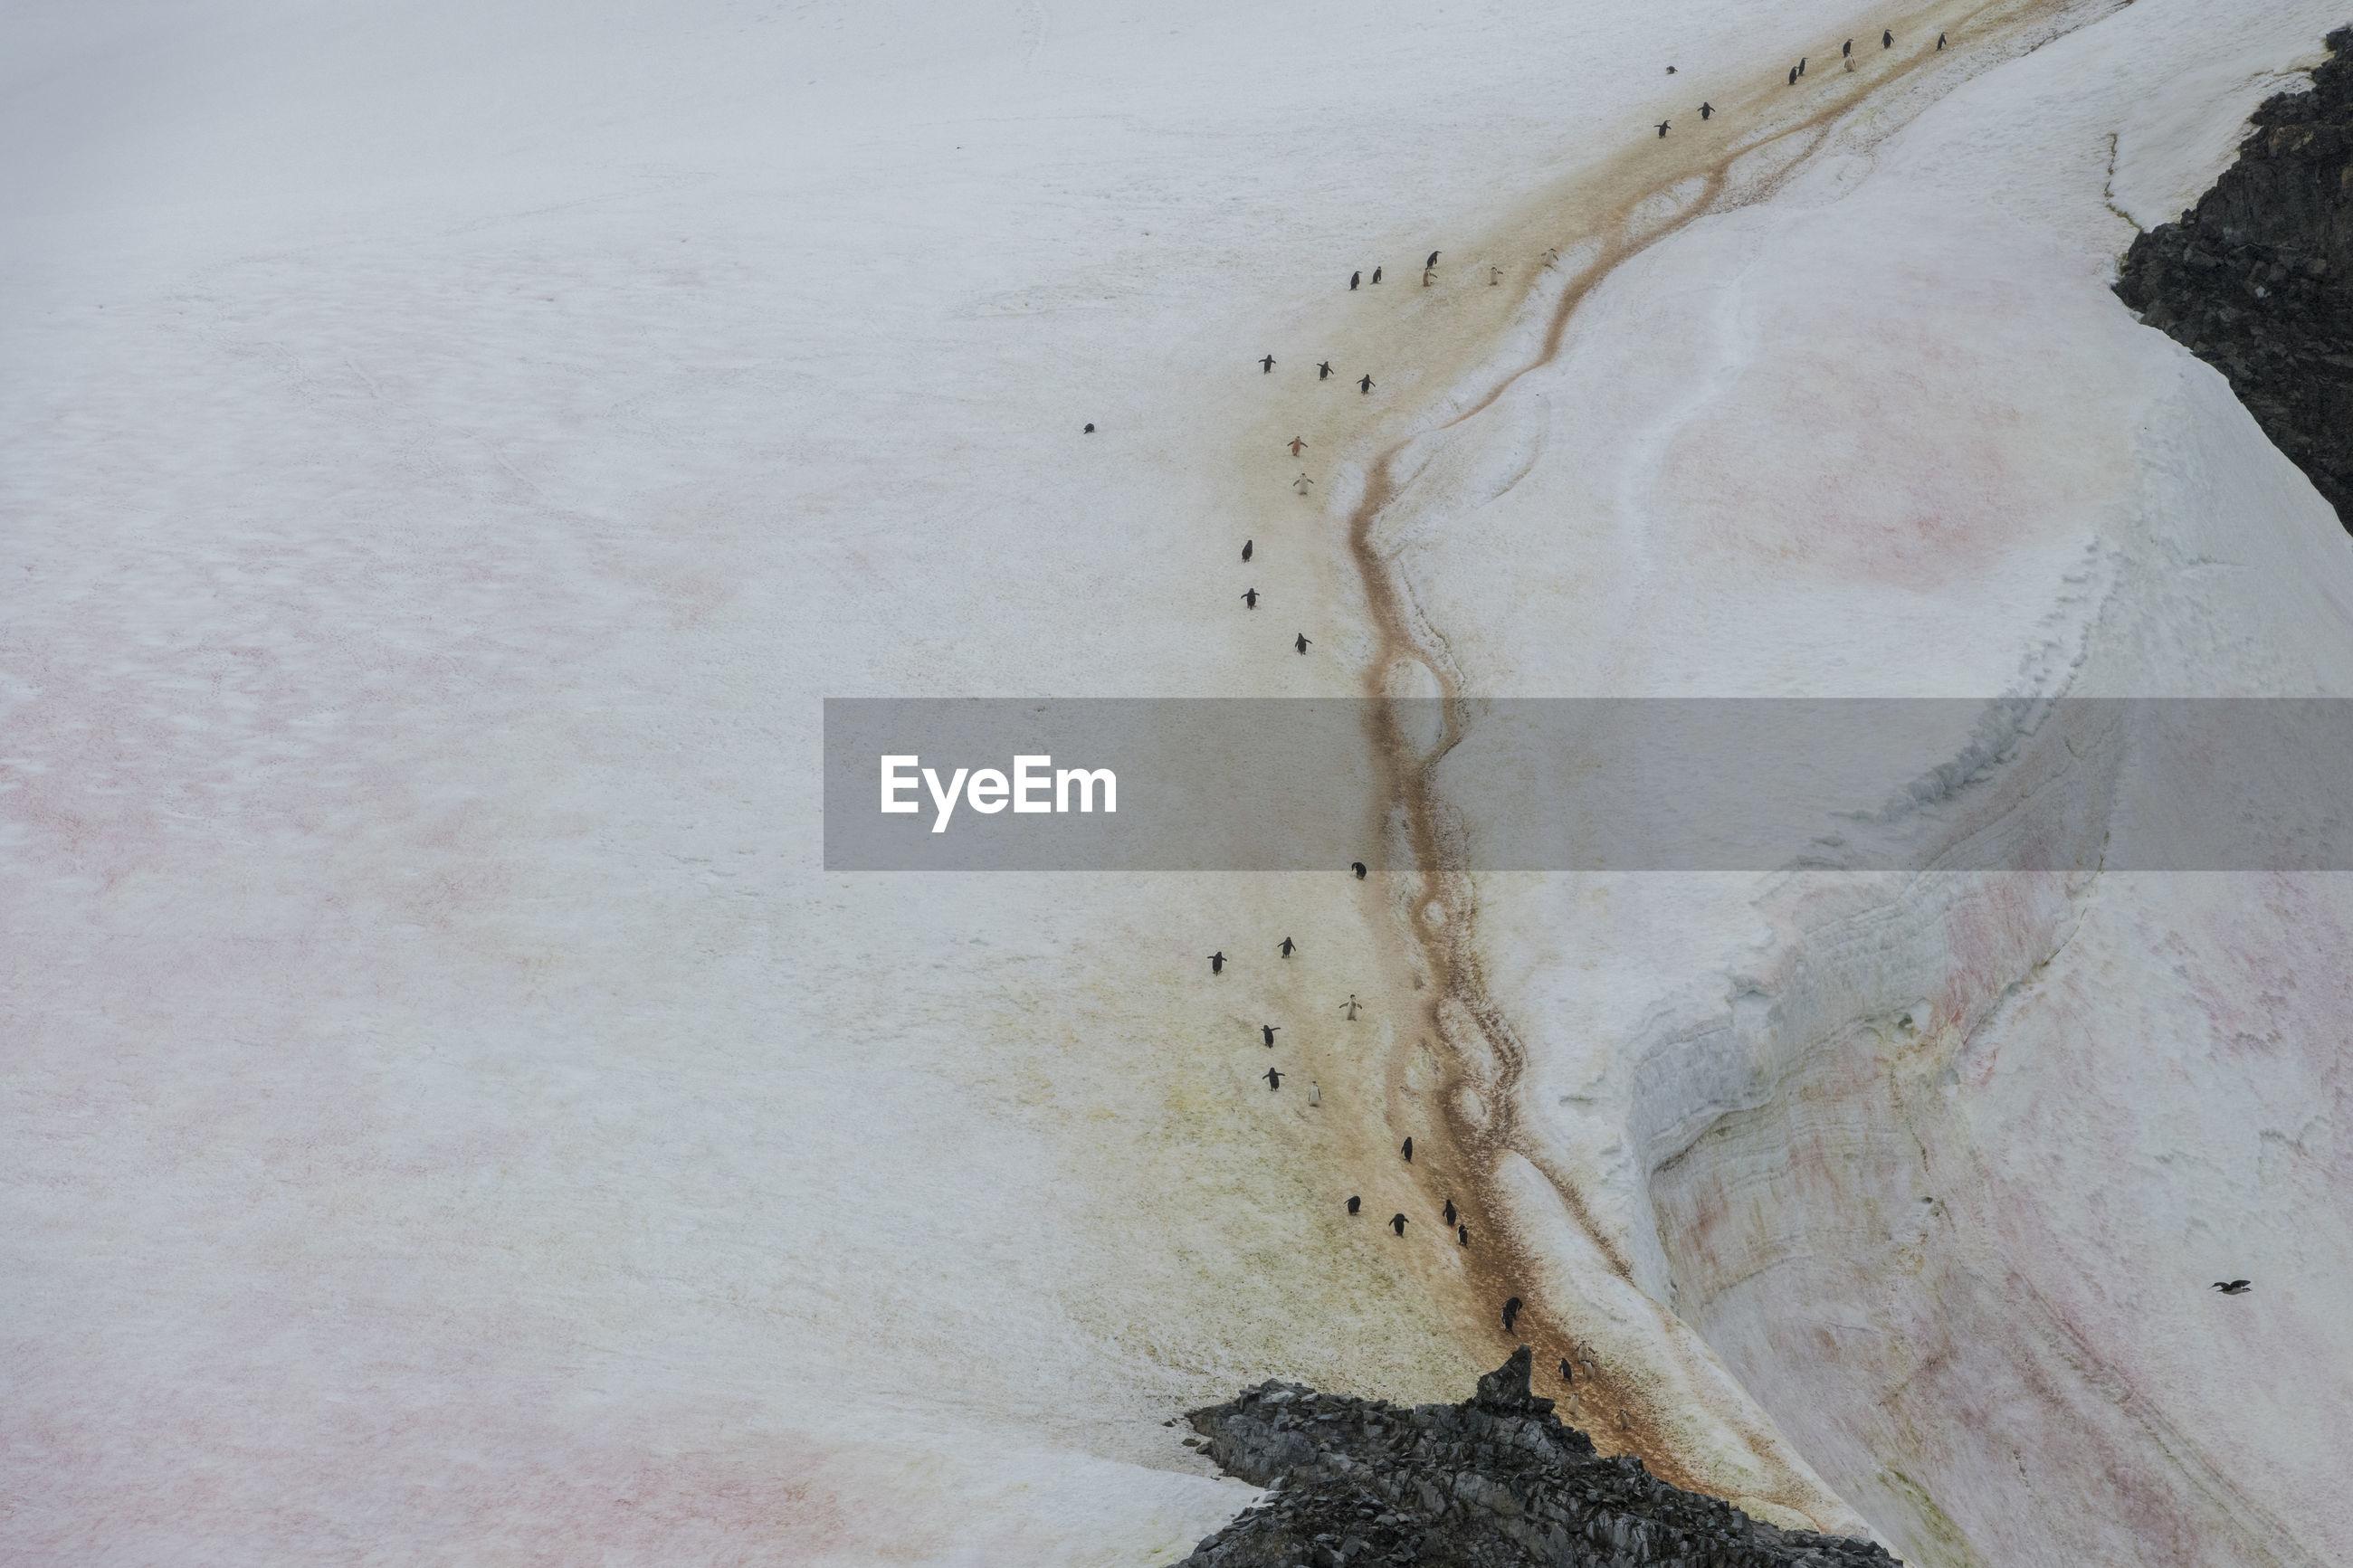 Penguin highway on a glacier, pink snow algae and chinstrap penguins, antarctica.